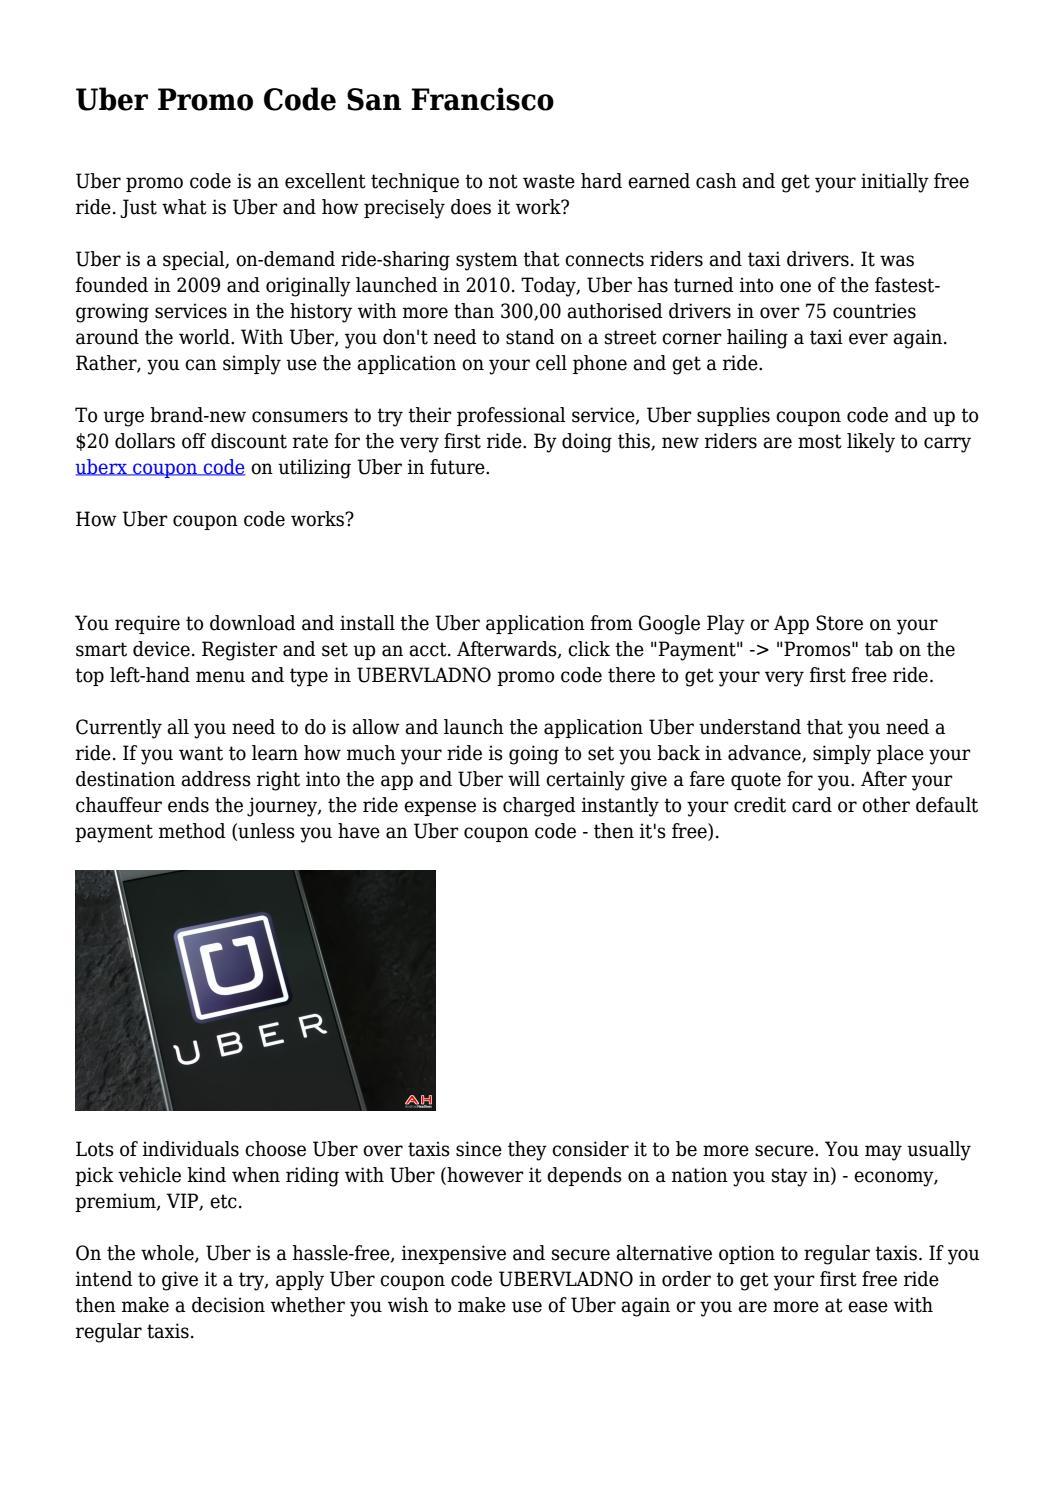 Uber Promo Code San Francisco    by travelworld4 - issuu